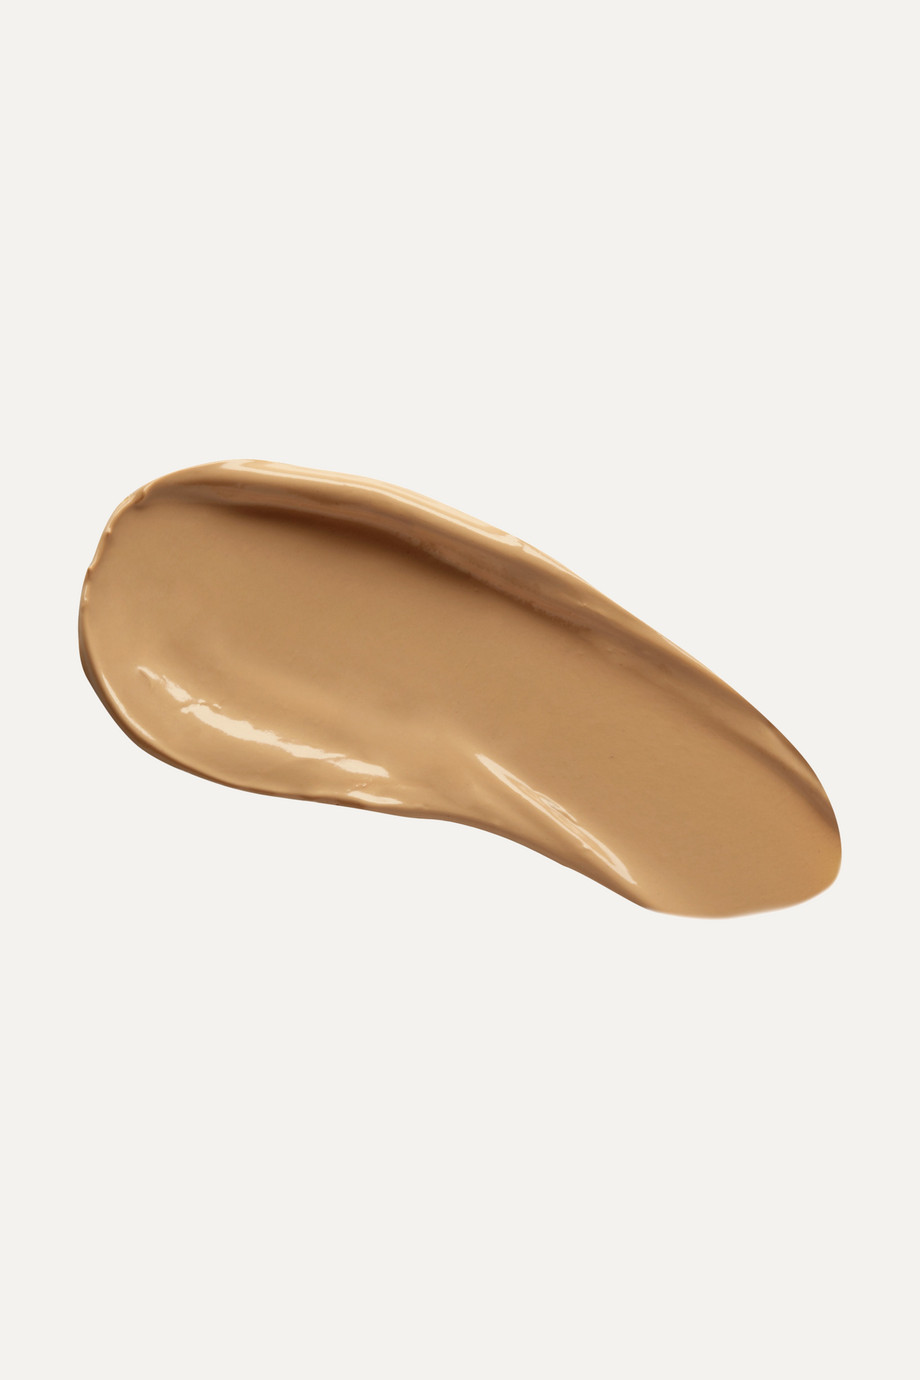 Chantecaille Just Skin Tinted Moisturizer SPF15 - Wheat, 50ml